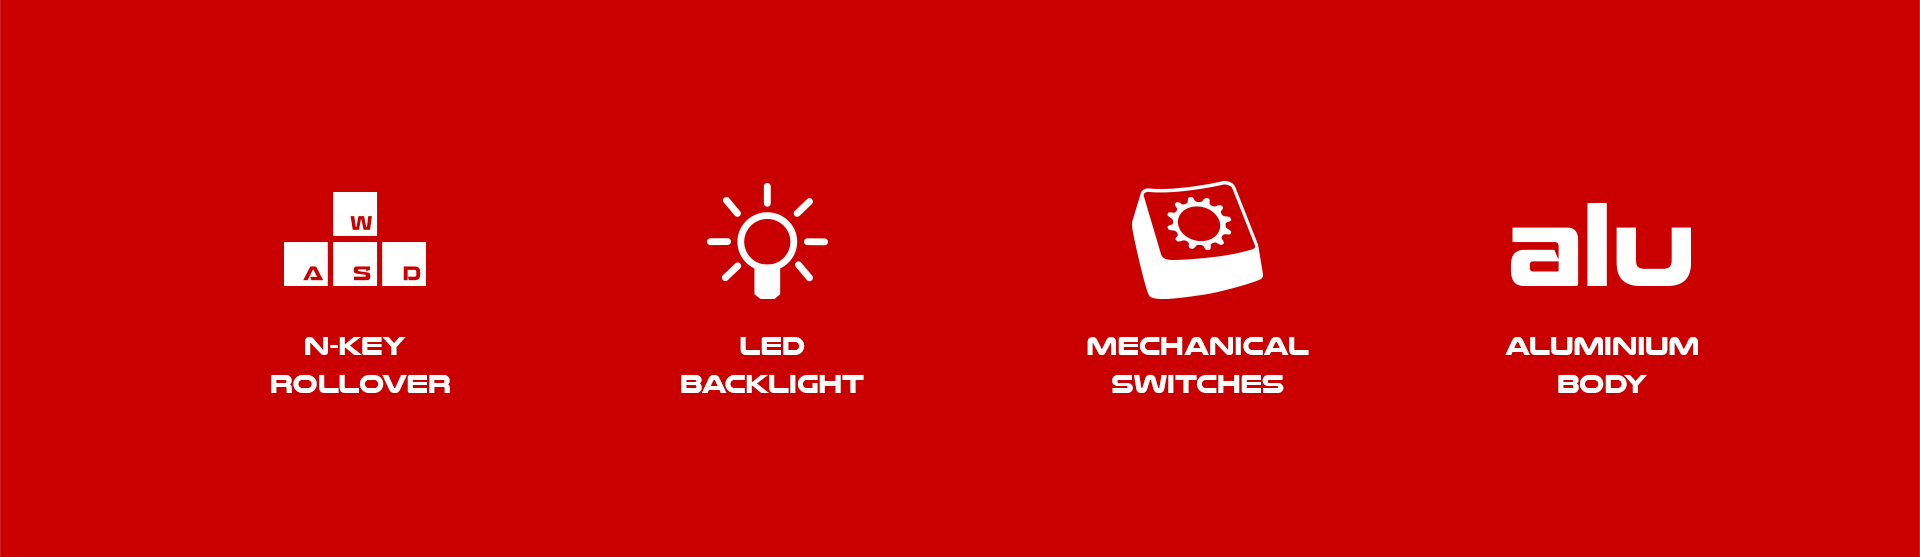 mechanical gaming keyboard genesis thor 300 tkl rgb ru layout rgb backlight red switch software 2